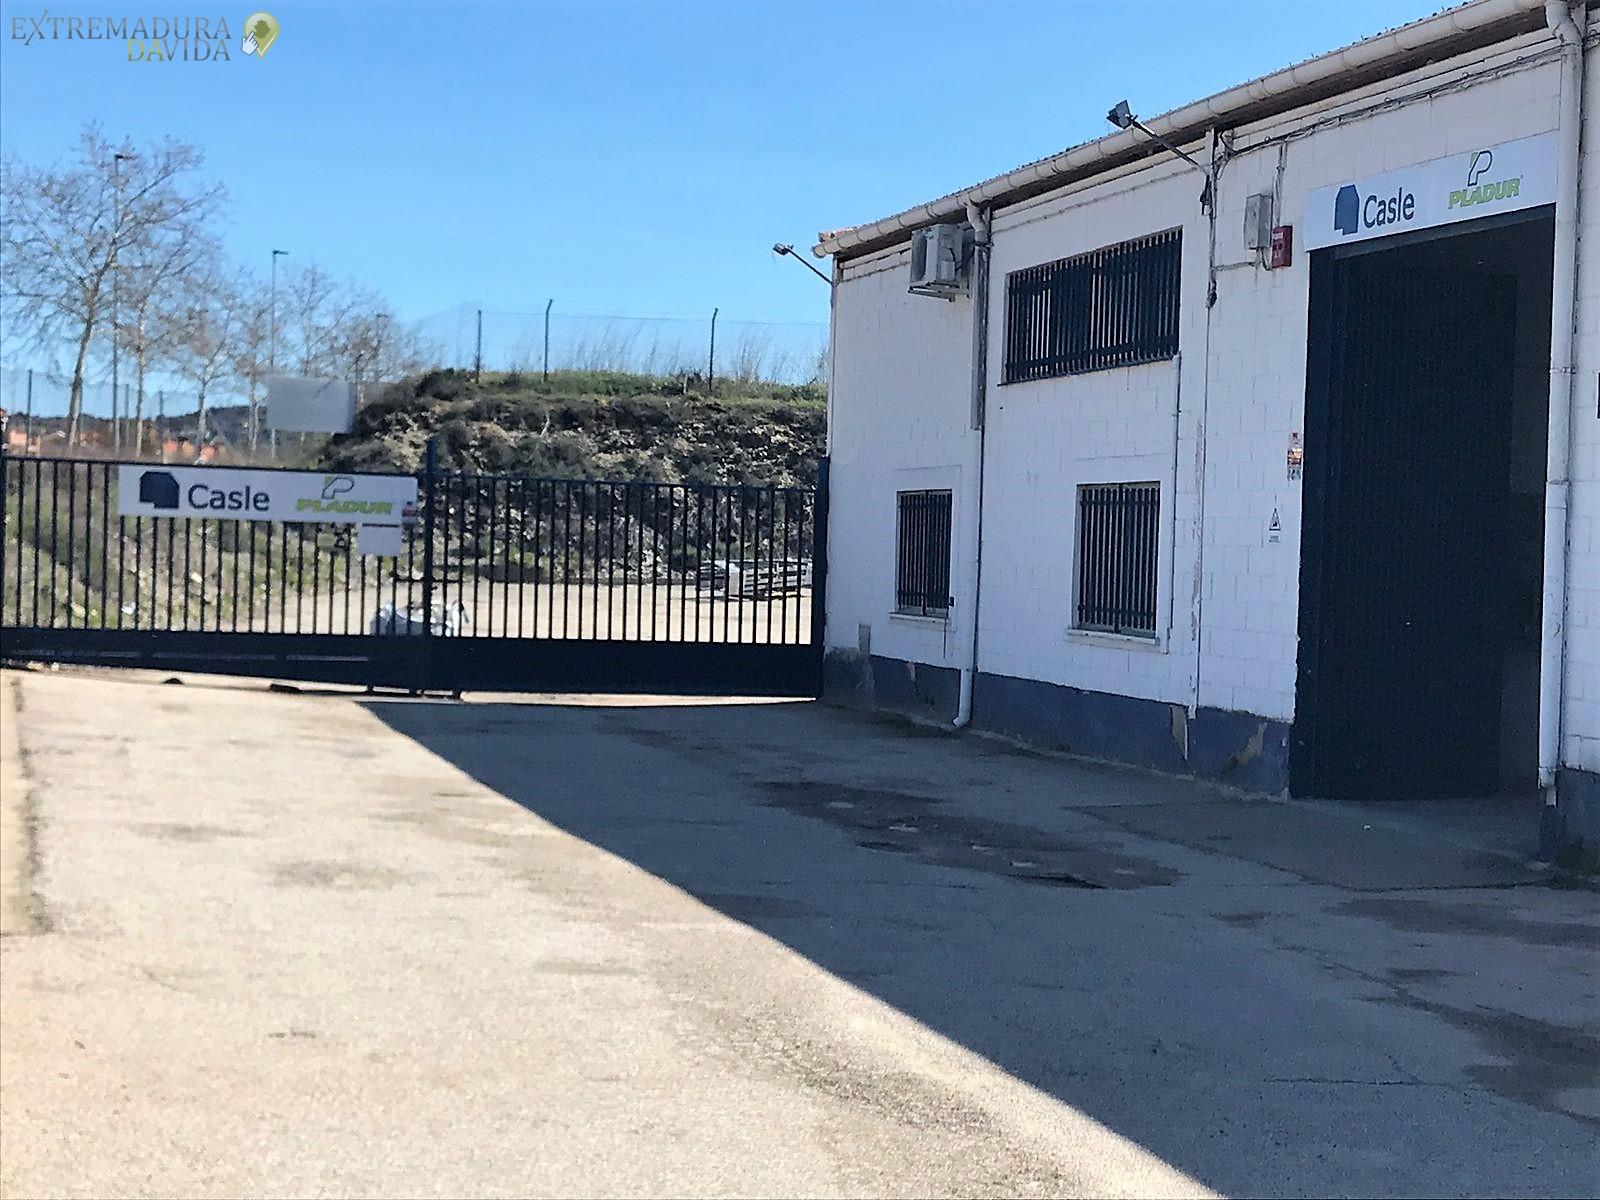 ALMACEN DISTRIBUCION AISLAMIENTOS PLADUR EXTREMADURA CASLE